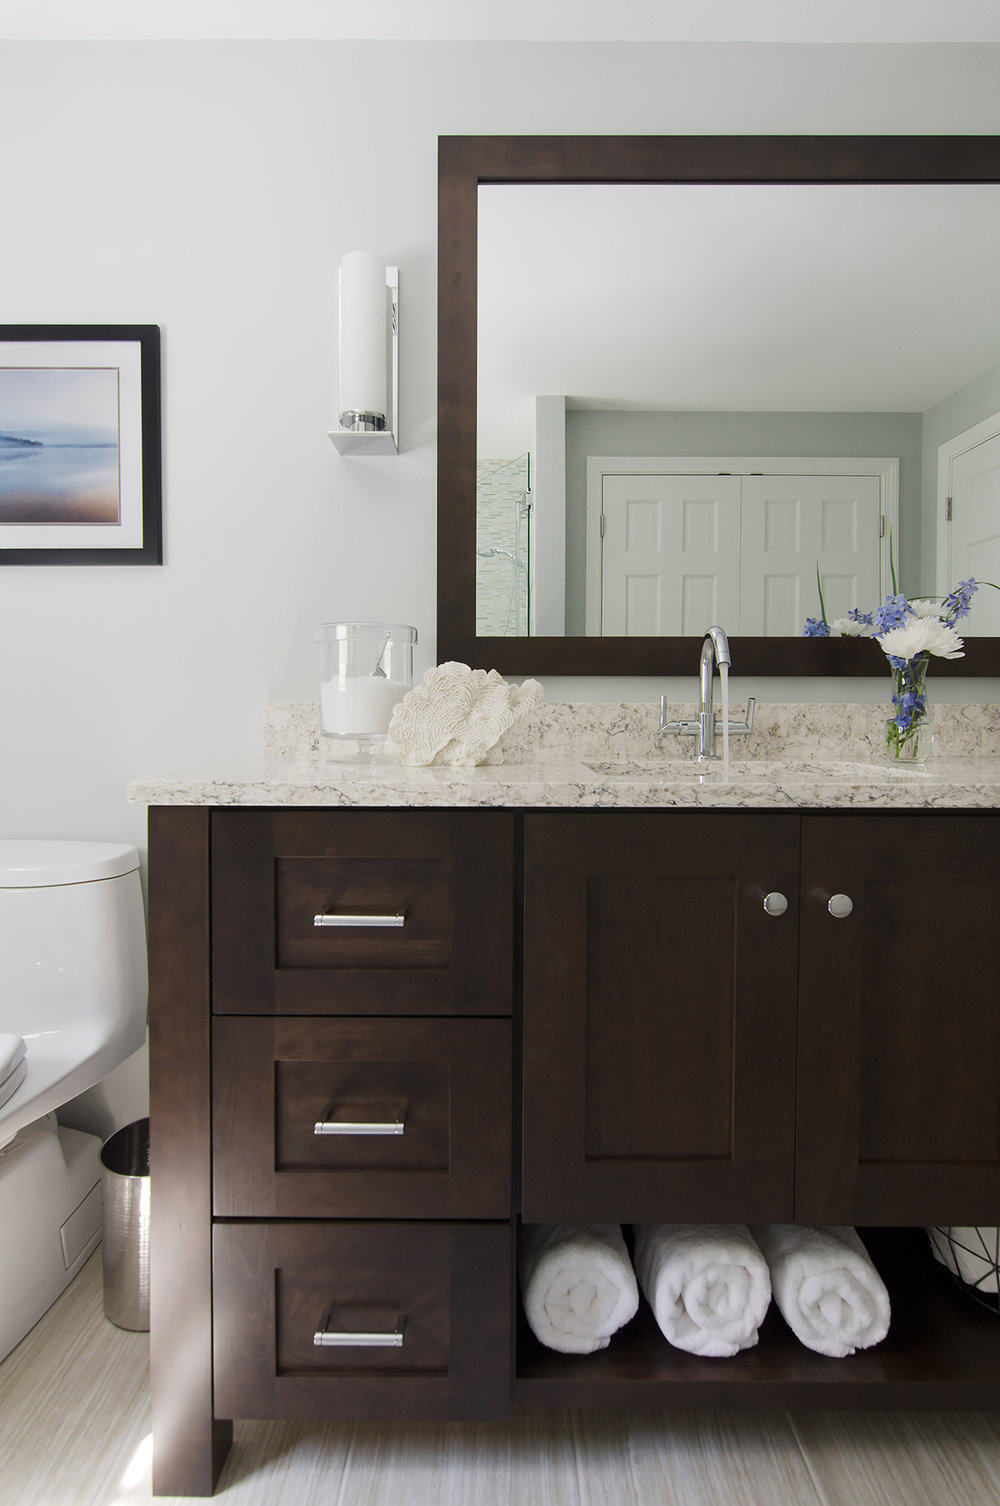 Norwell, MA bathroom interior design by Susan Curtis Interiors